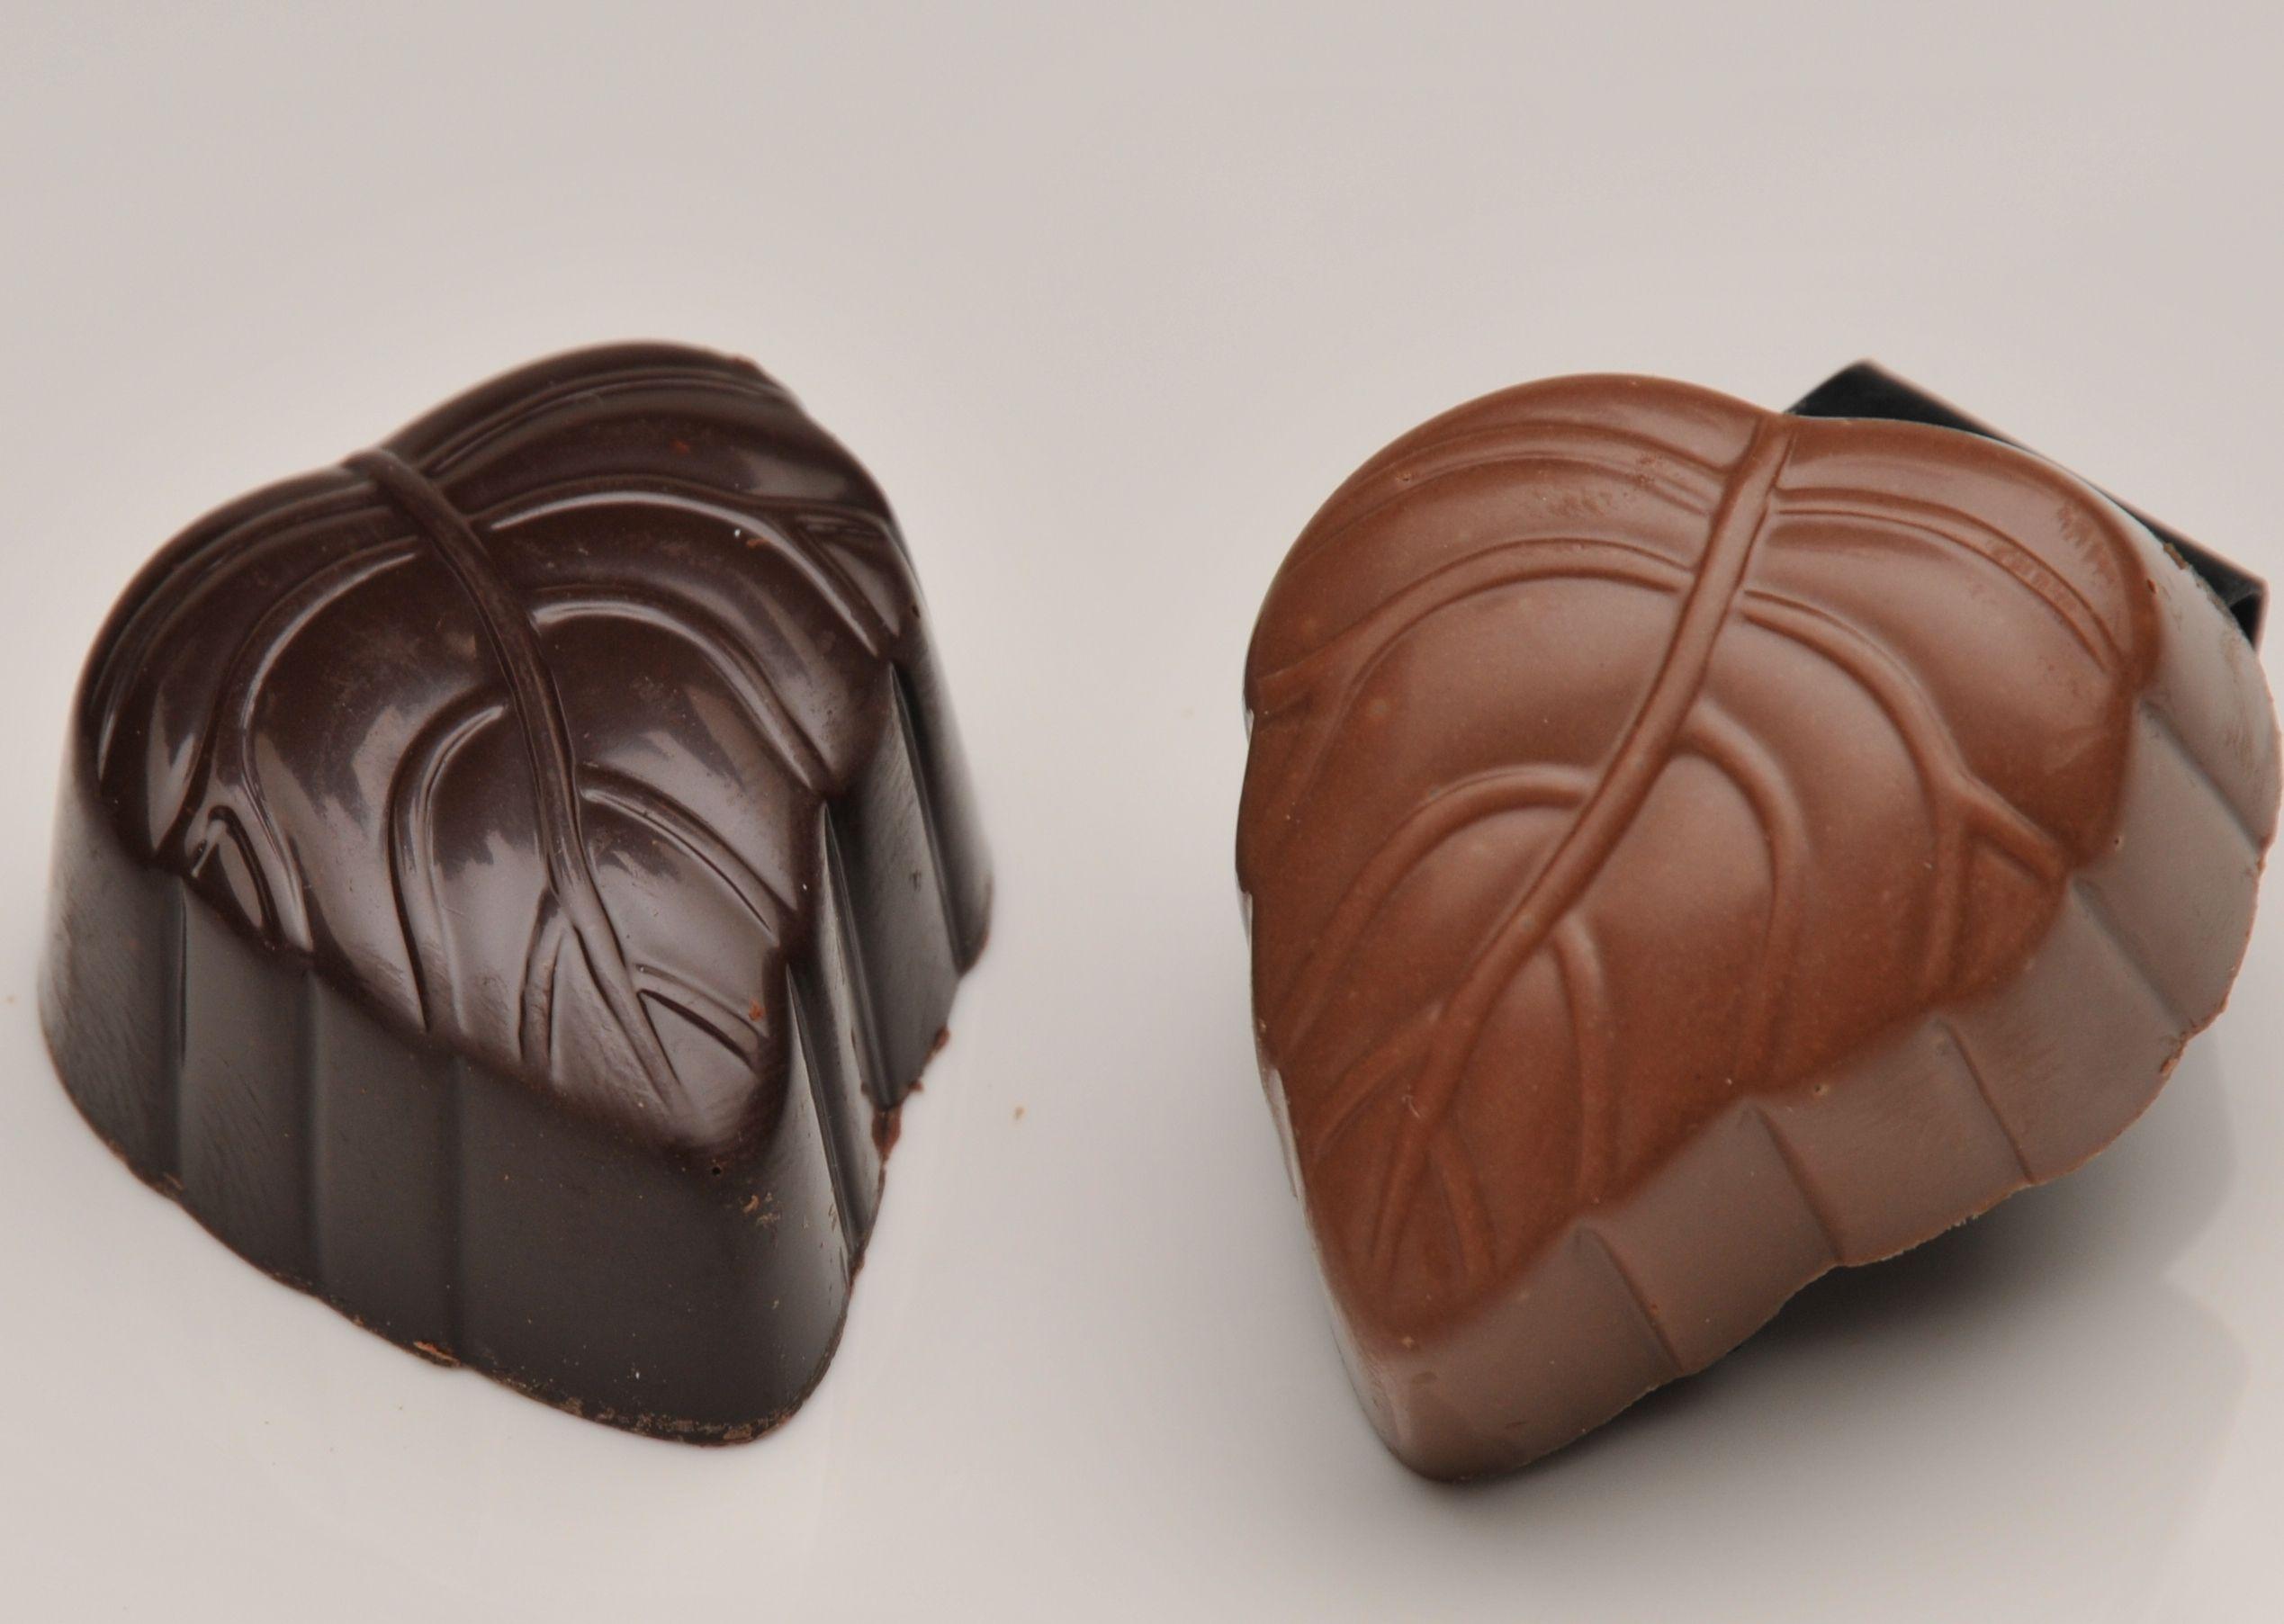 Bladje - Rich, Silky smooth chocolate ganache.